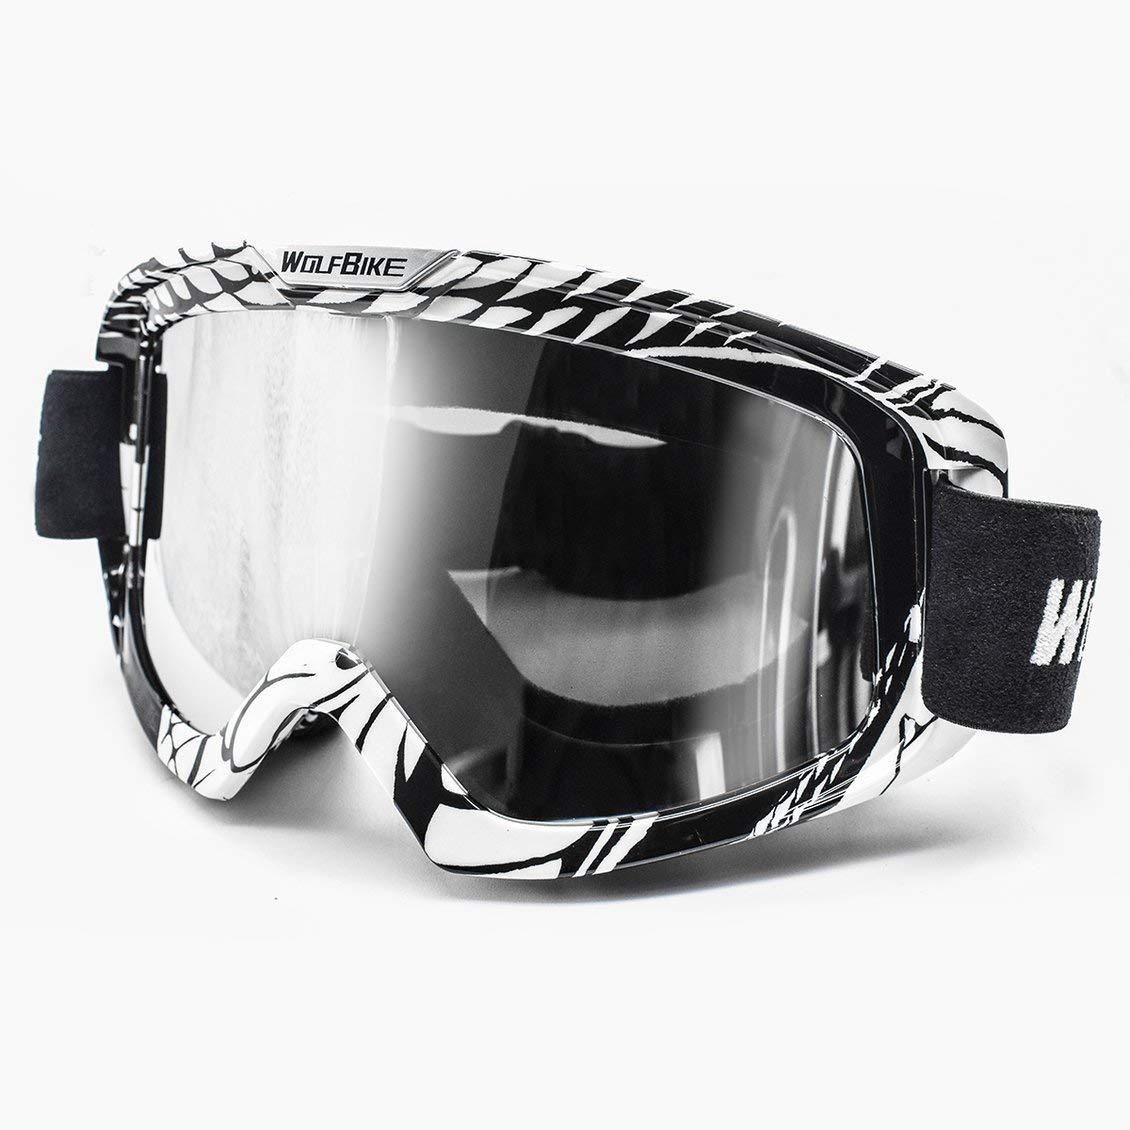 ForceSthrength Lunettes de Ski Anti-bu/ée Wolfbike BYJ-019 Lunettes de Motocross Respirantes en Snowboard